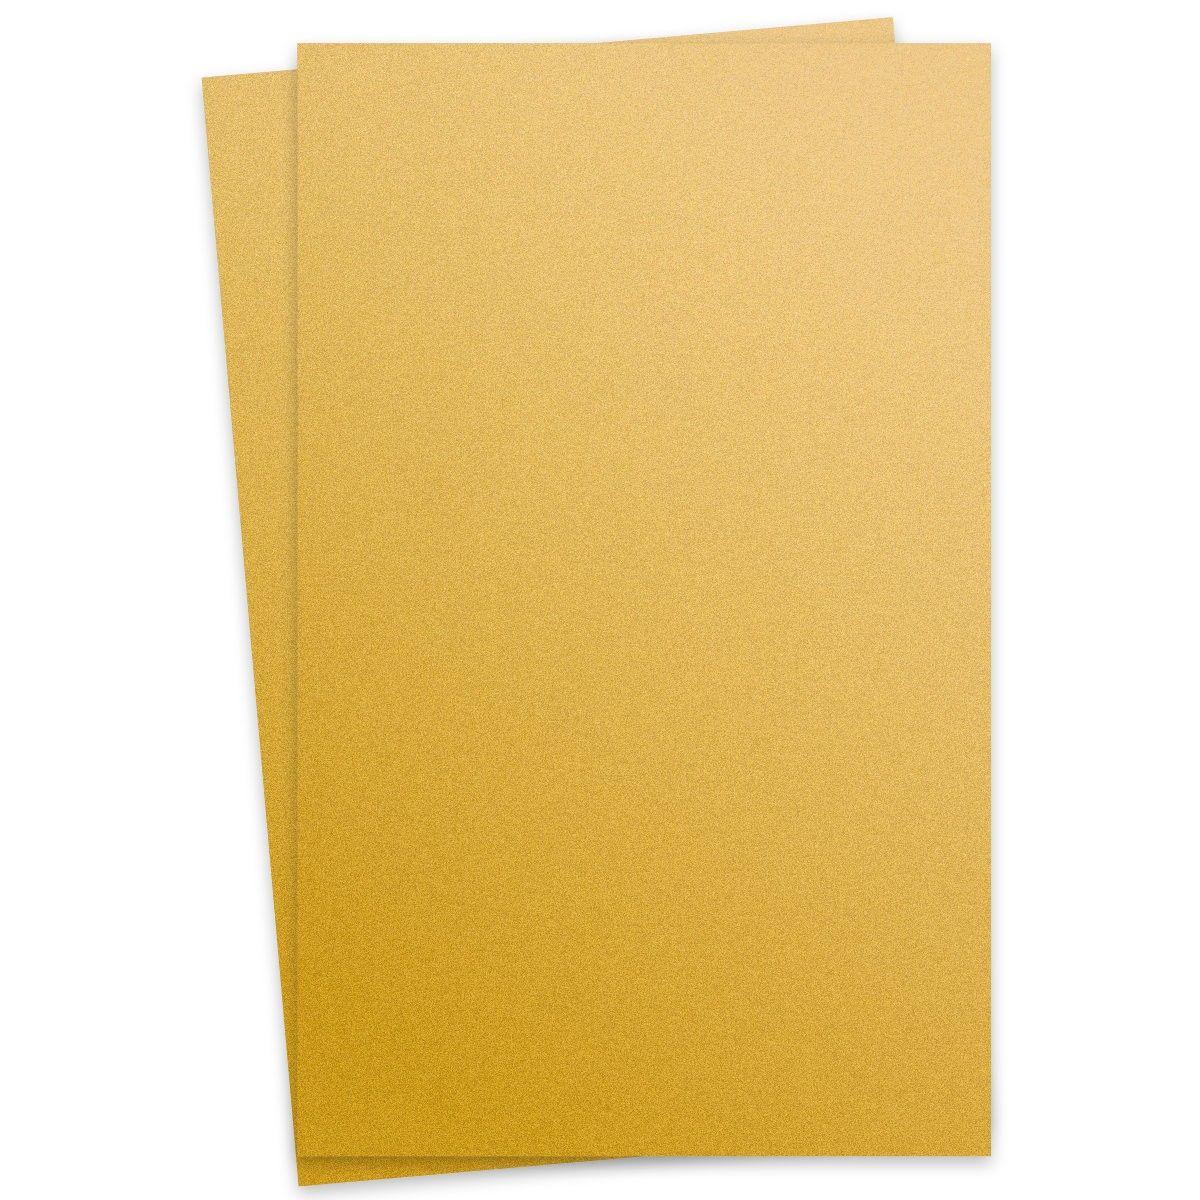 Curious Metallic Super Gold 11x17 Card Stock Paper 111lb Cover 100 Pk In 2021 Cardstock Paper Paper 11x17